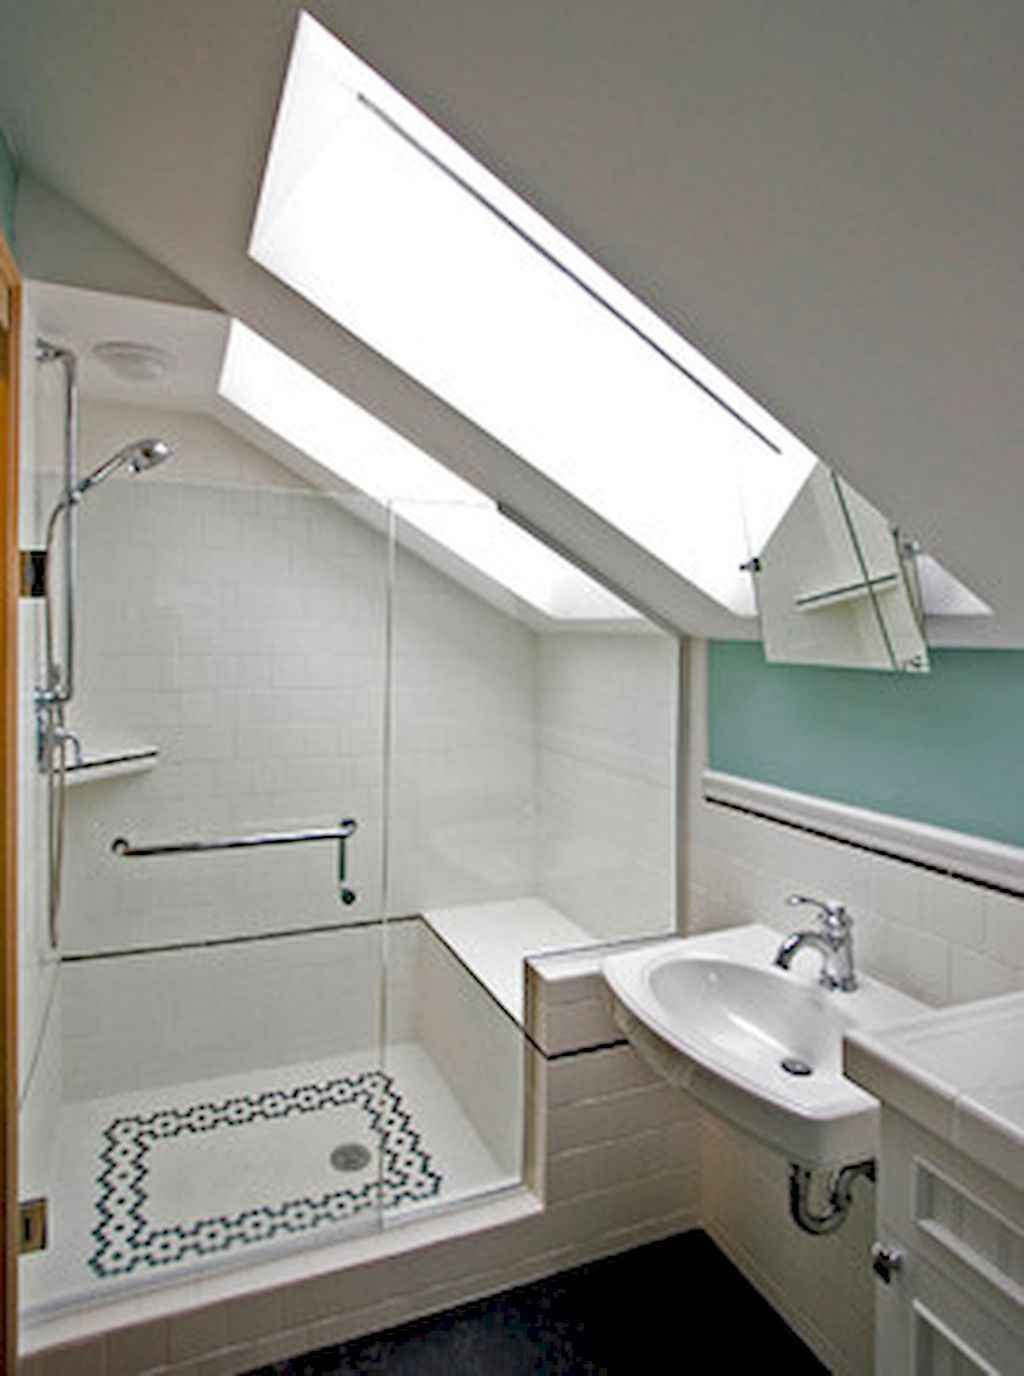 Attic Bathroom Makeover Ideas On A Budget 19 Homespecially